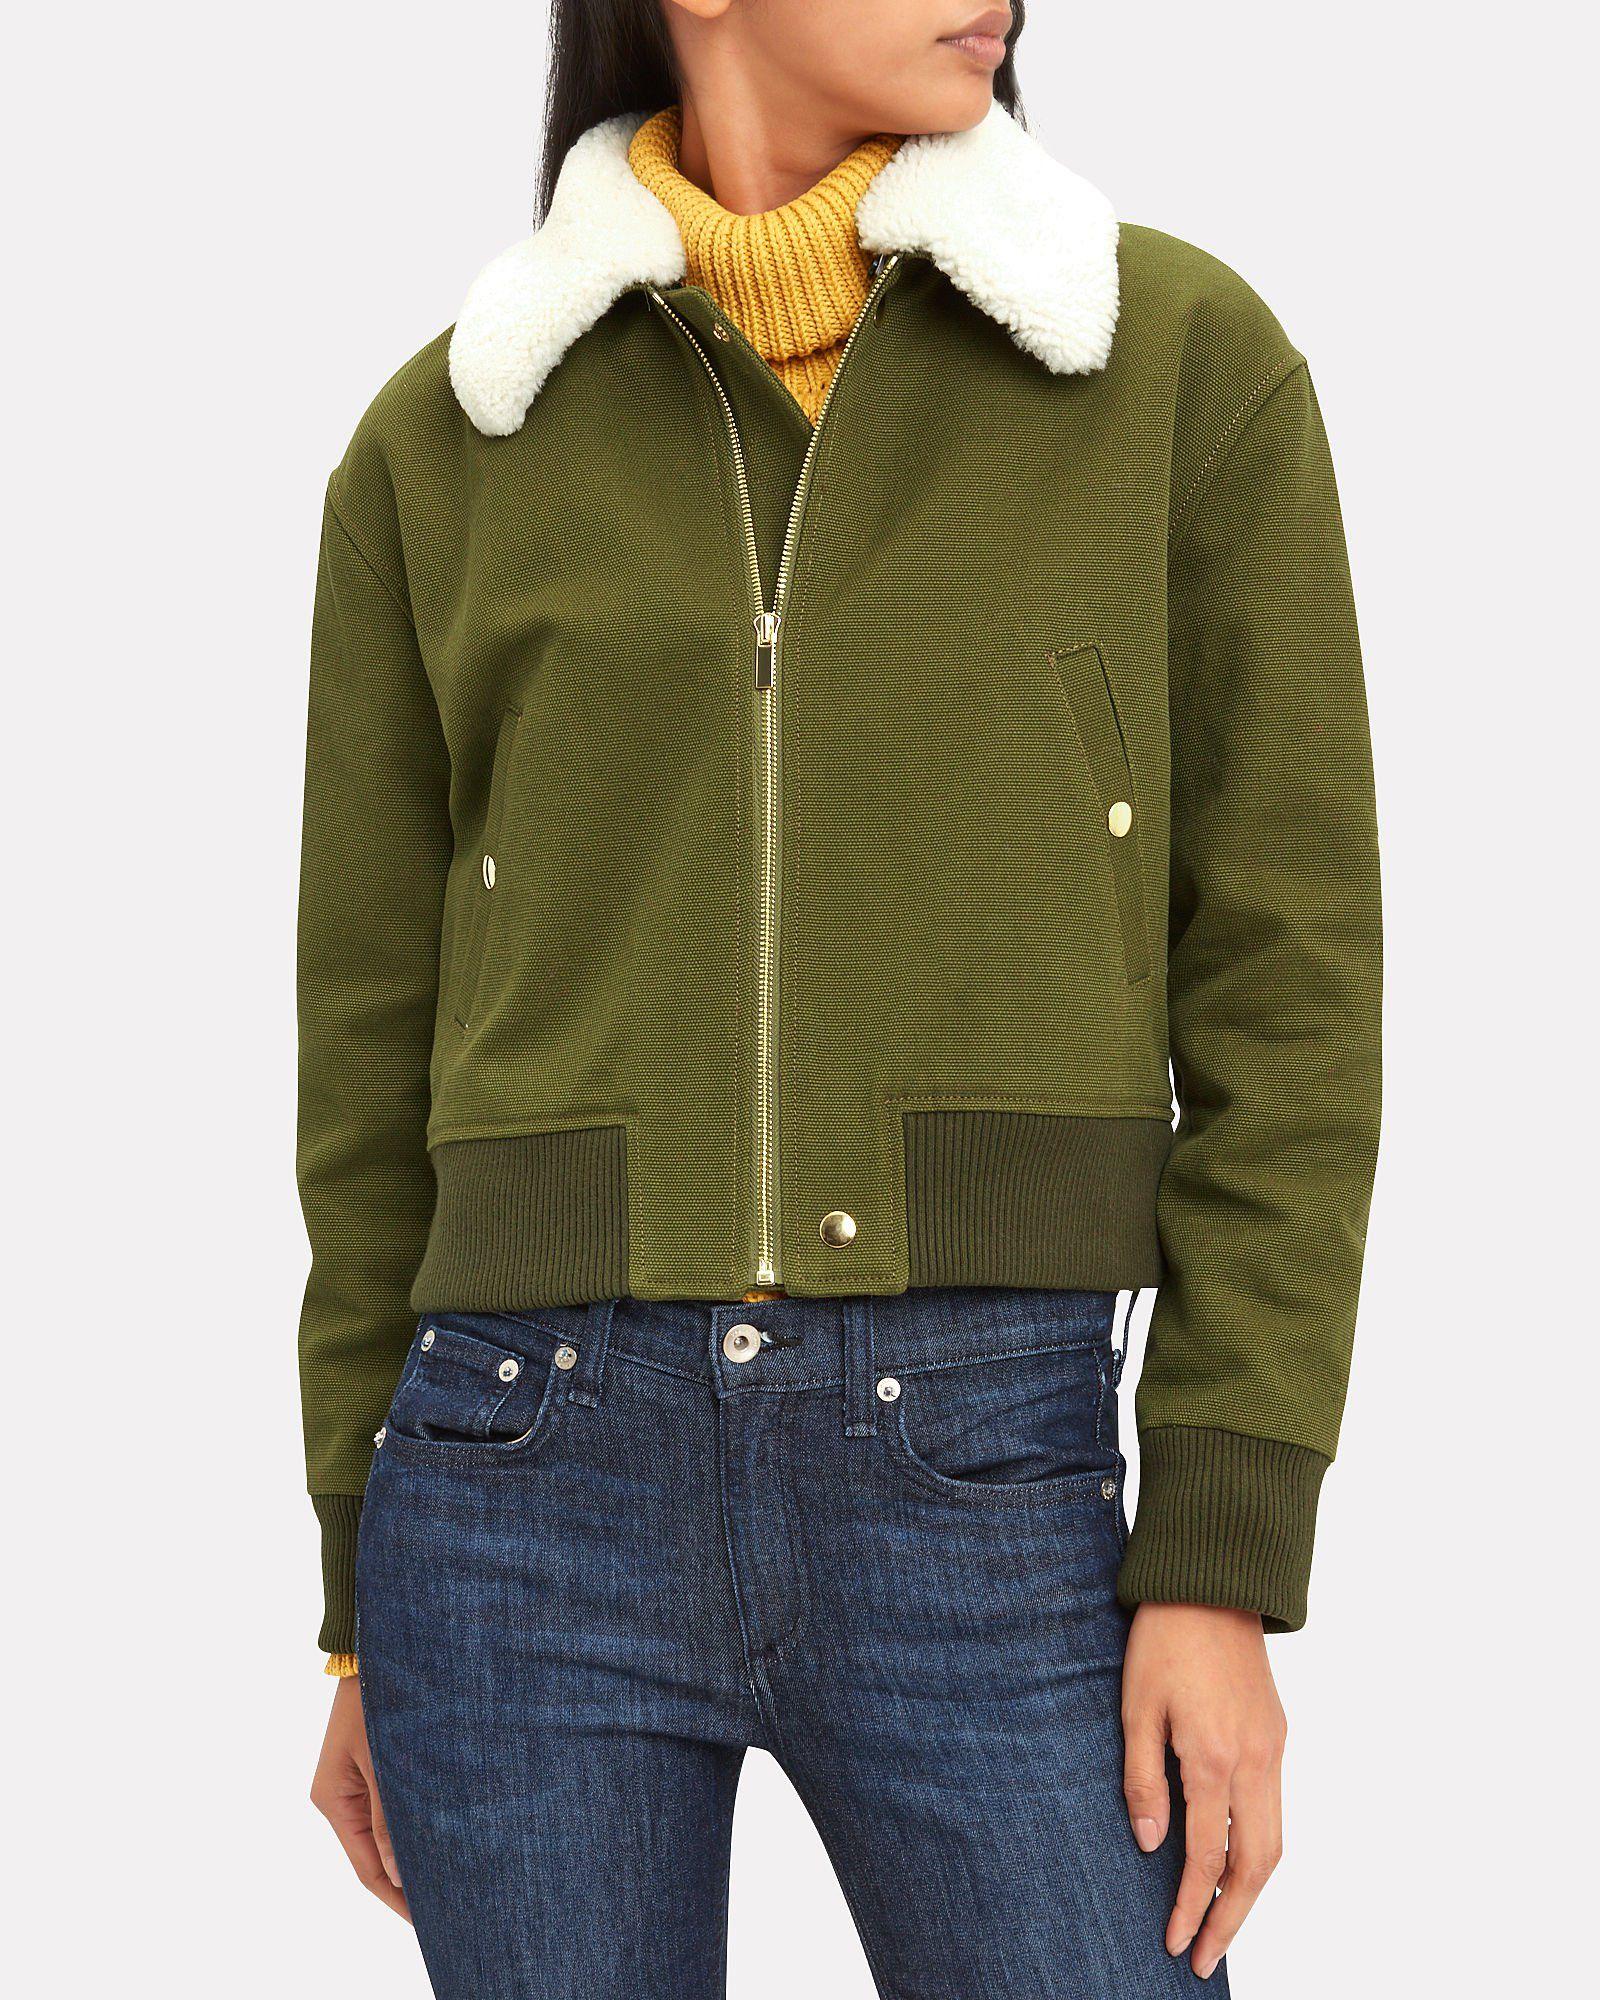 Shearling Collar Army Green Bomber Jacket, ARMY GREEN